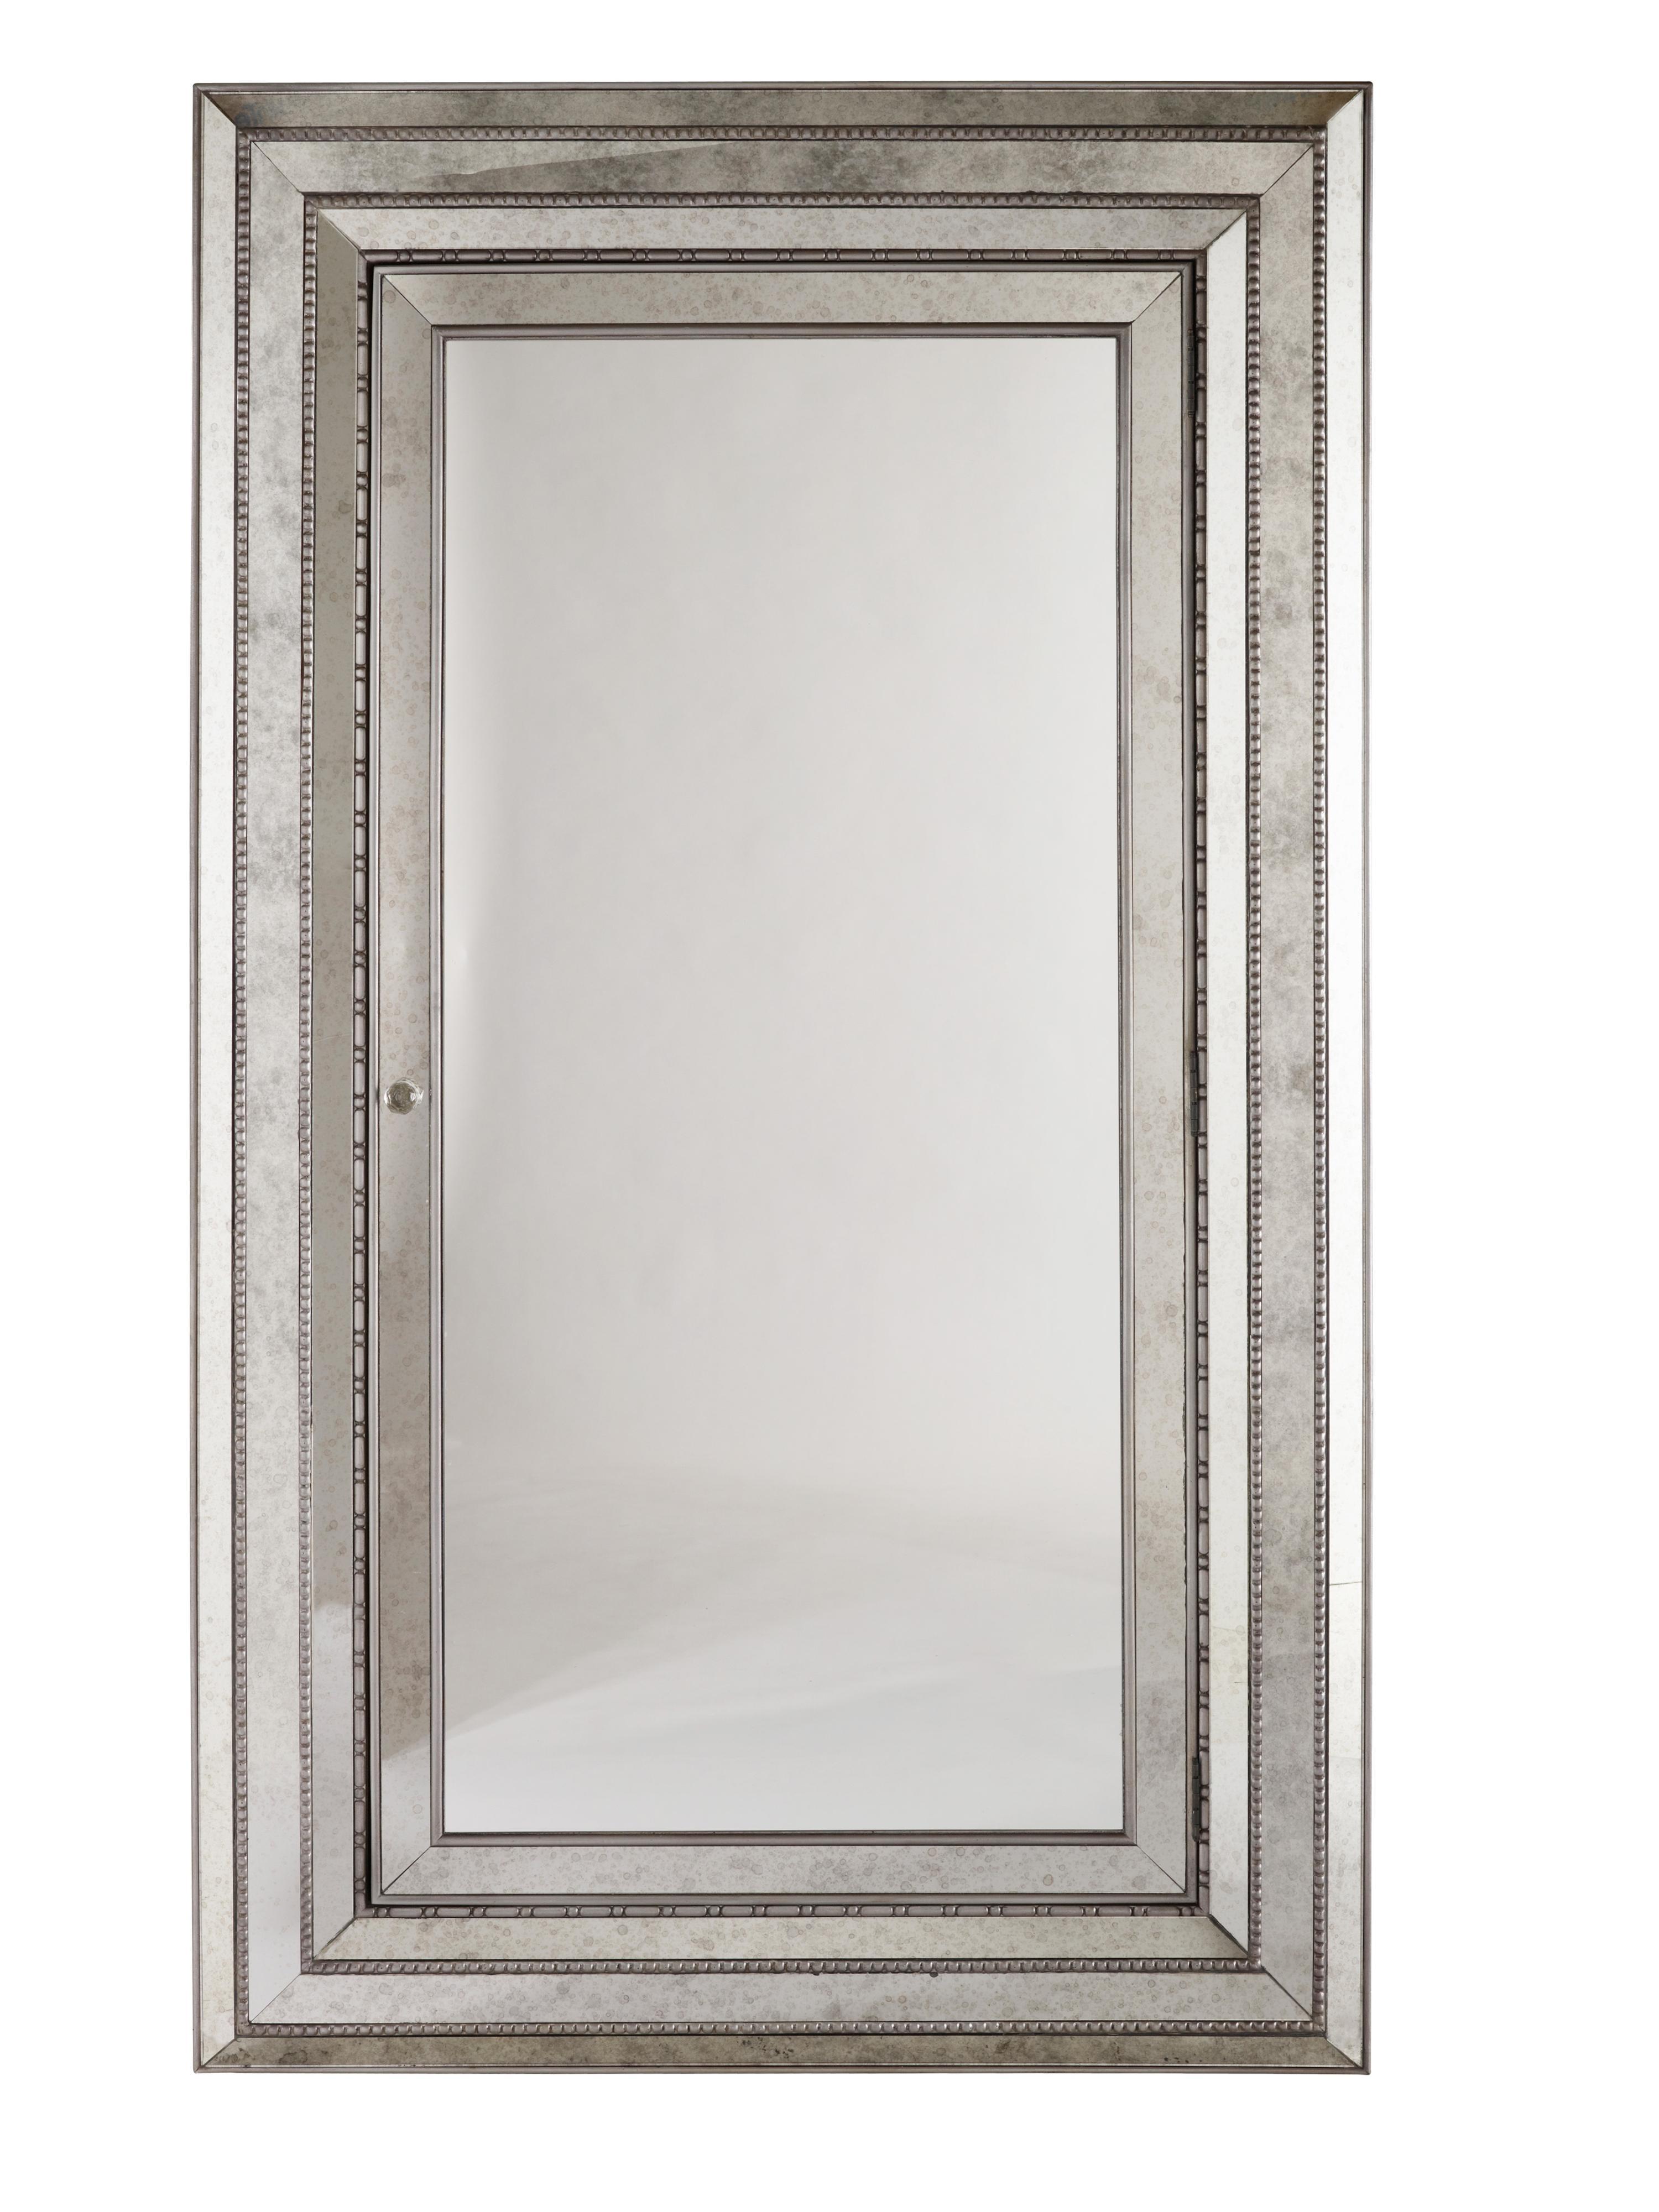 Mélange Glamour Floor Mirror by Hooker Furniture at Stoney Creek Furniture